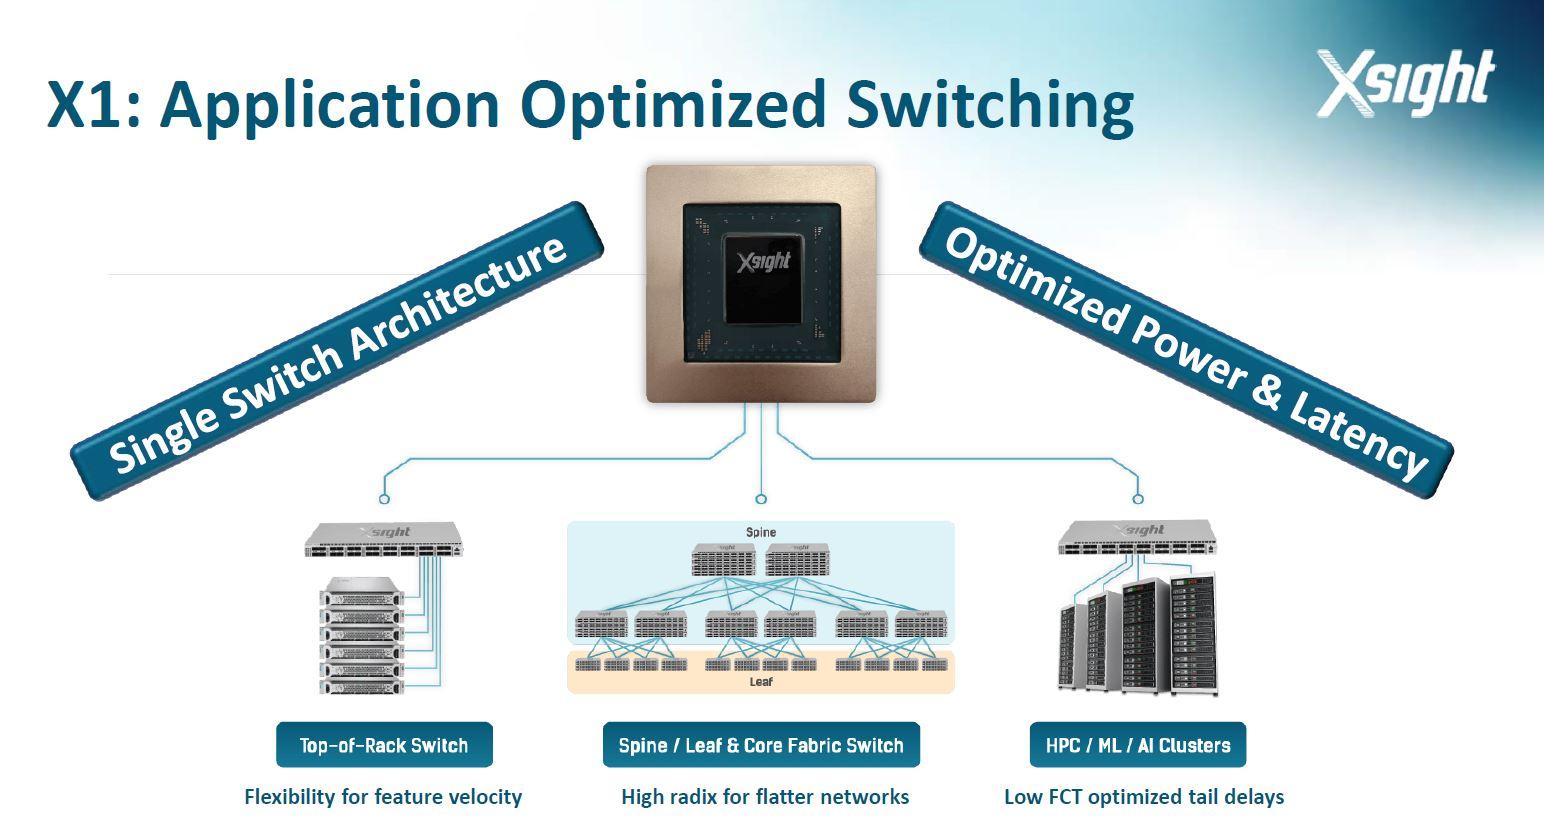 Xsight X1 Single Architecture For Many Markets